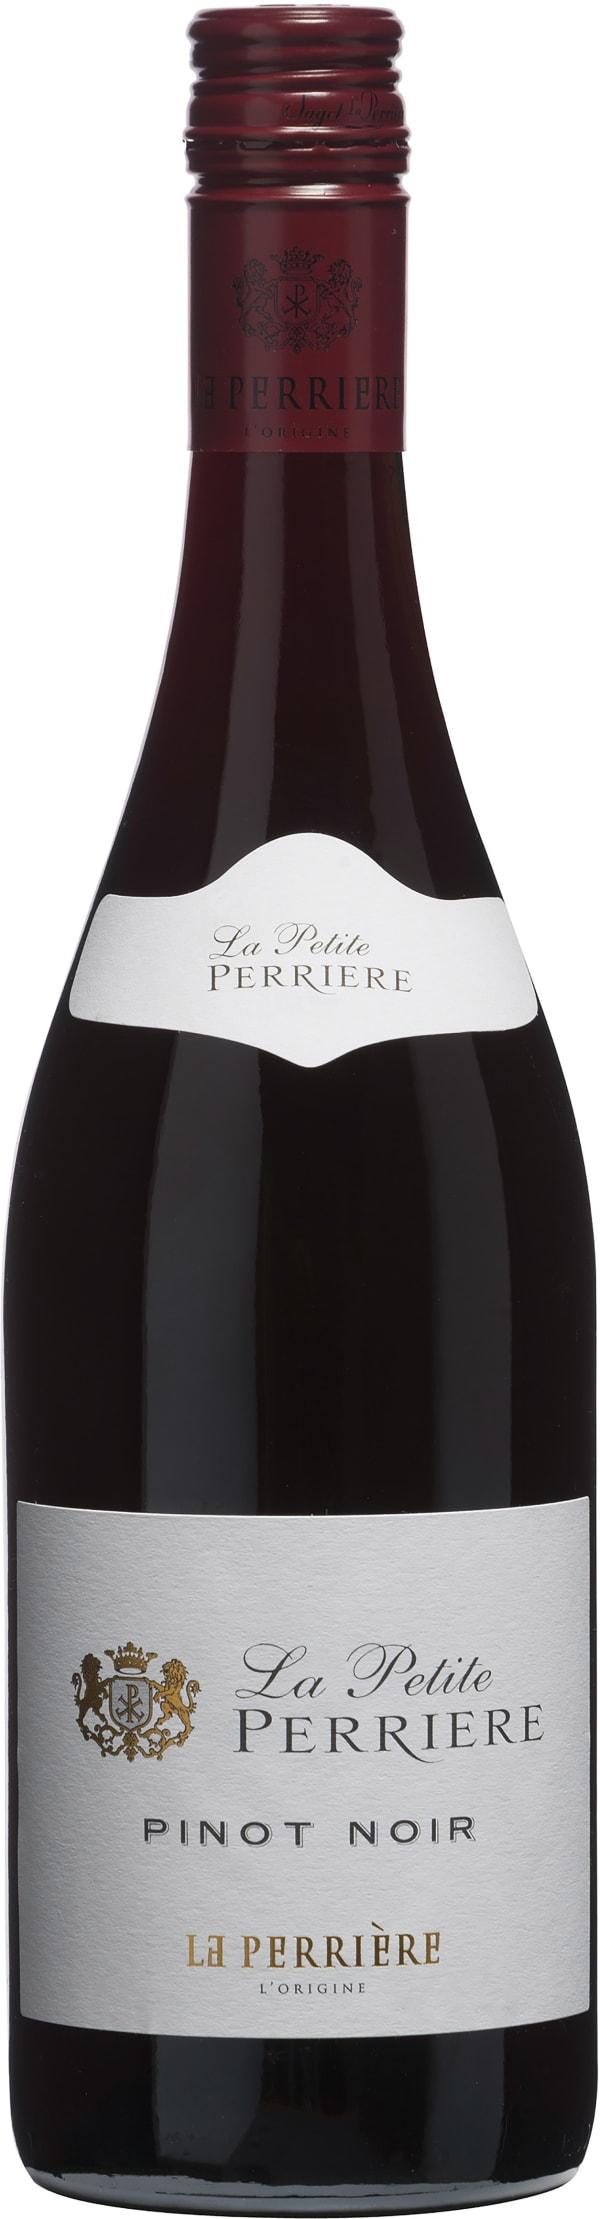 La Petite Perriere Pinot Noir 2017